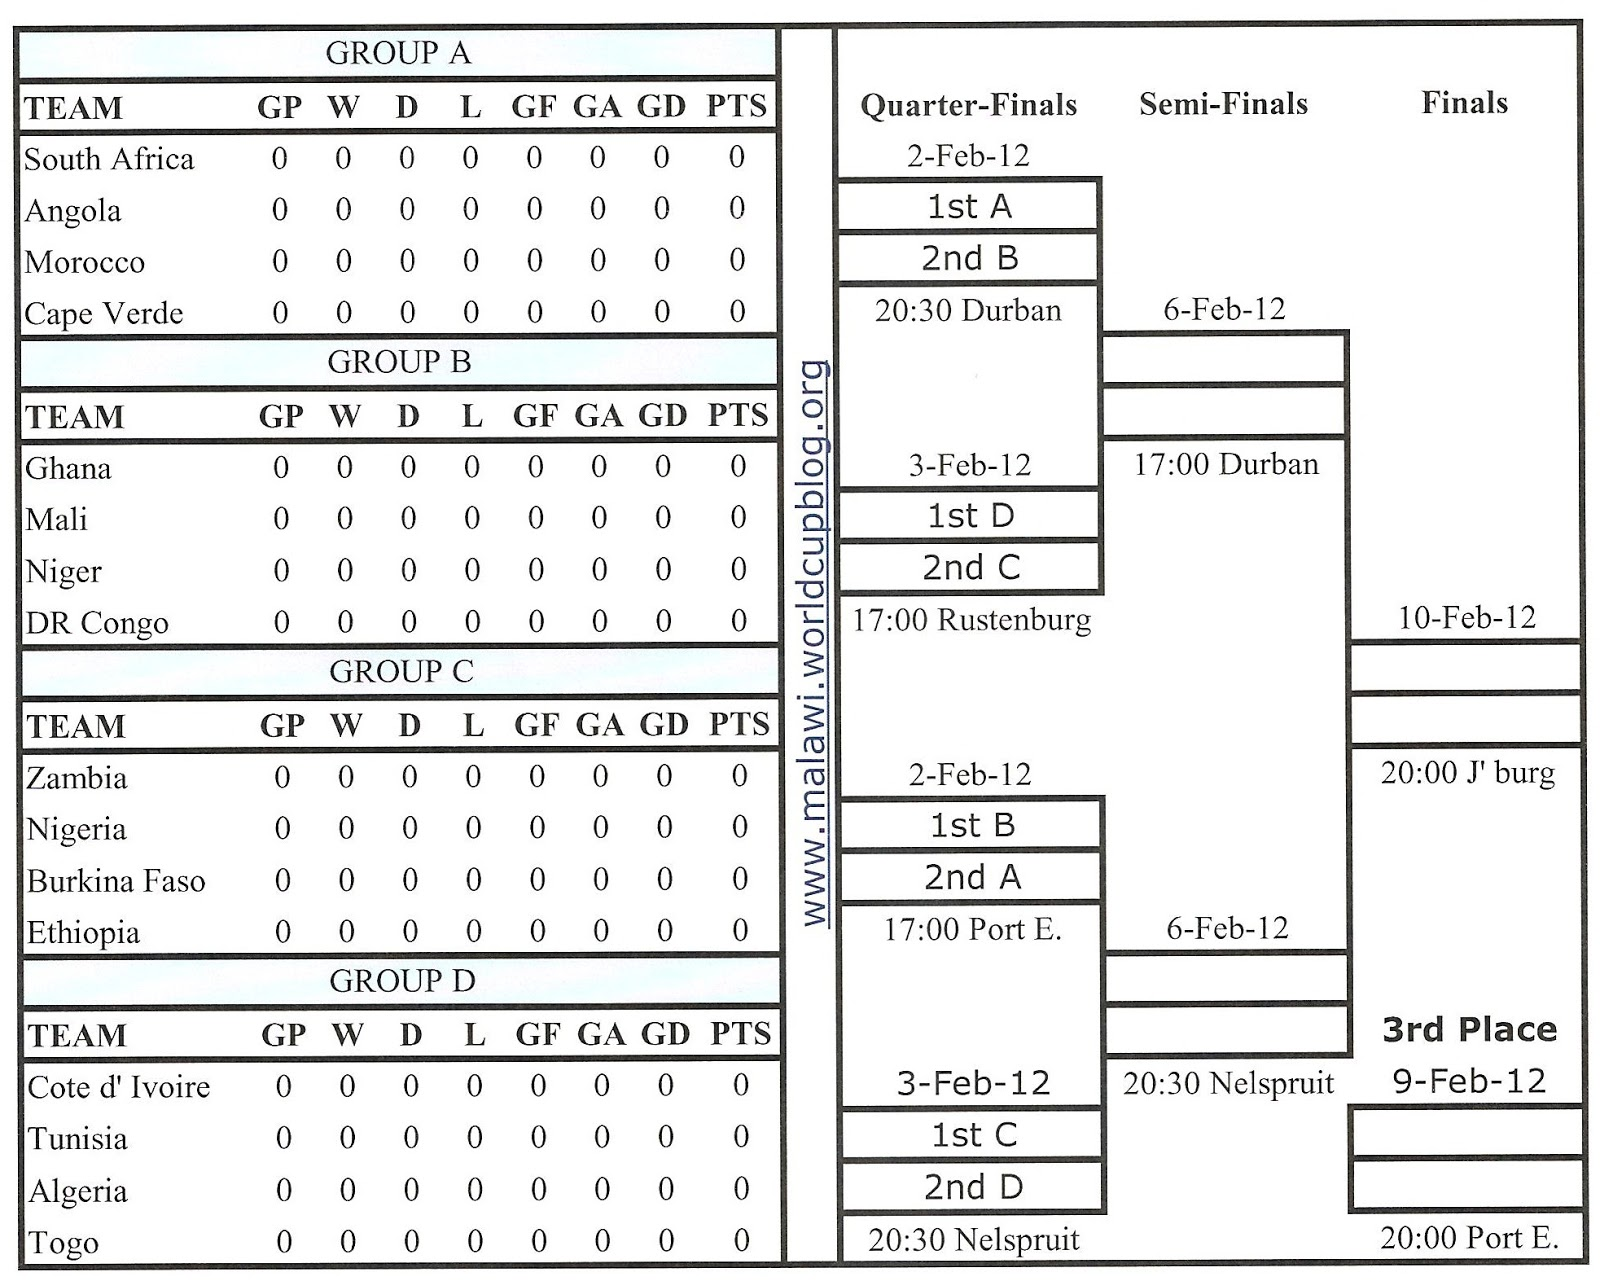 Calendario Coppa Dafrica.Coppa D Africa 2013 Gruppi Calendario Tabellone E